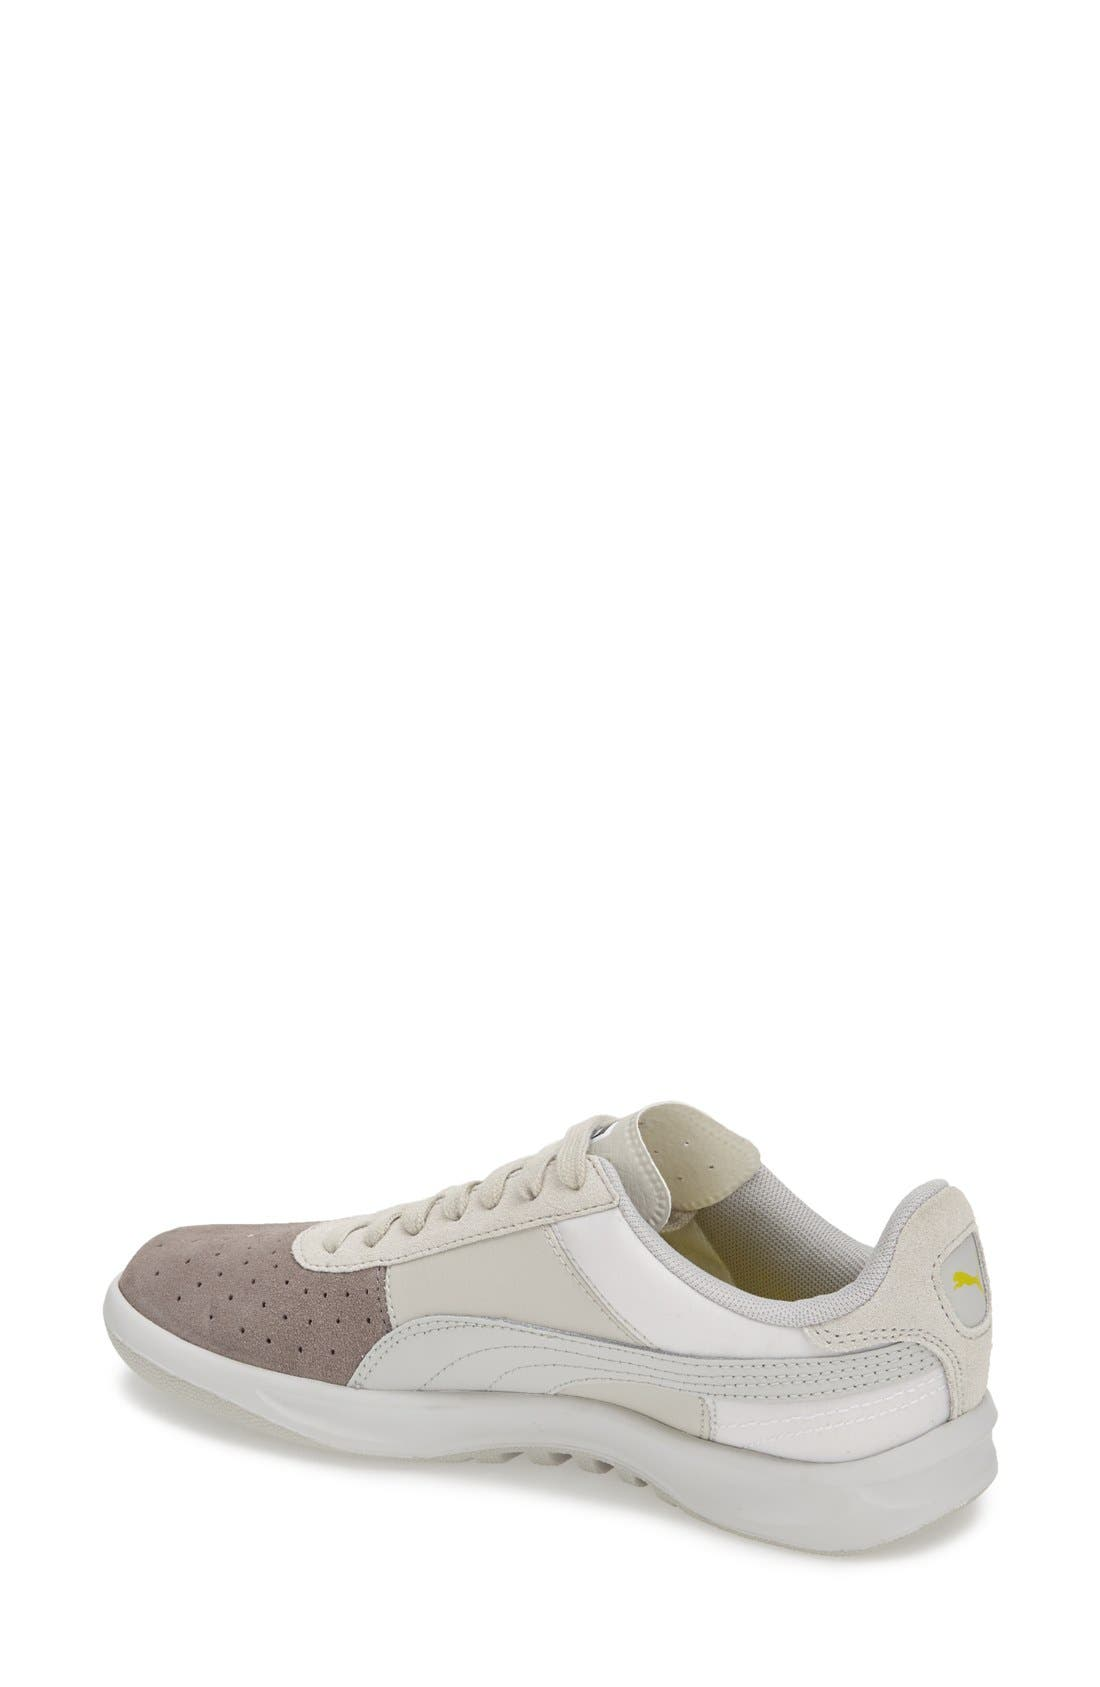 Alternate Image 2  - PUMA 'G. Vilas - Blocks and Stripes' Sneaker (Women)